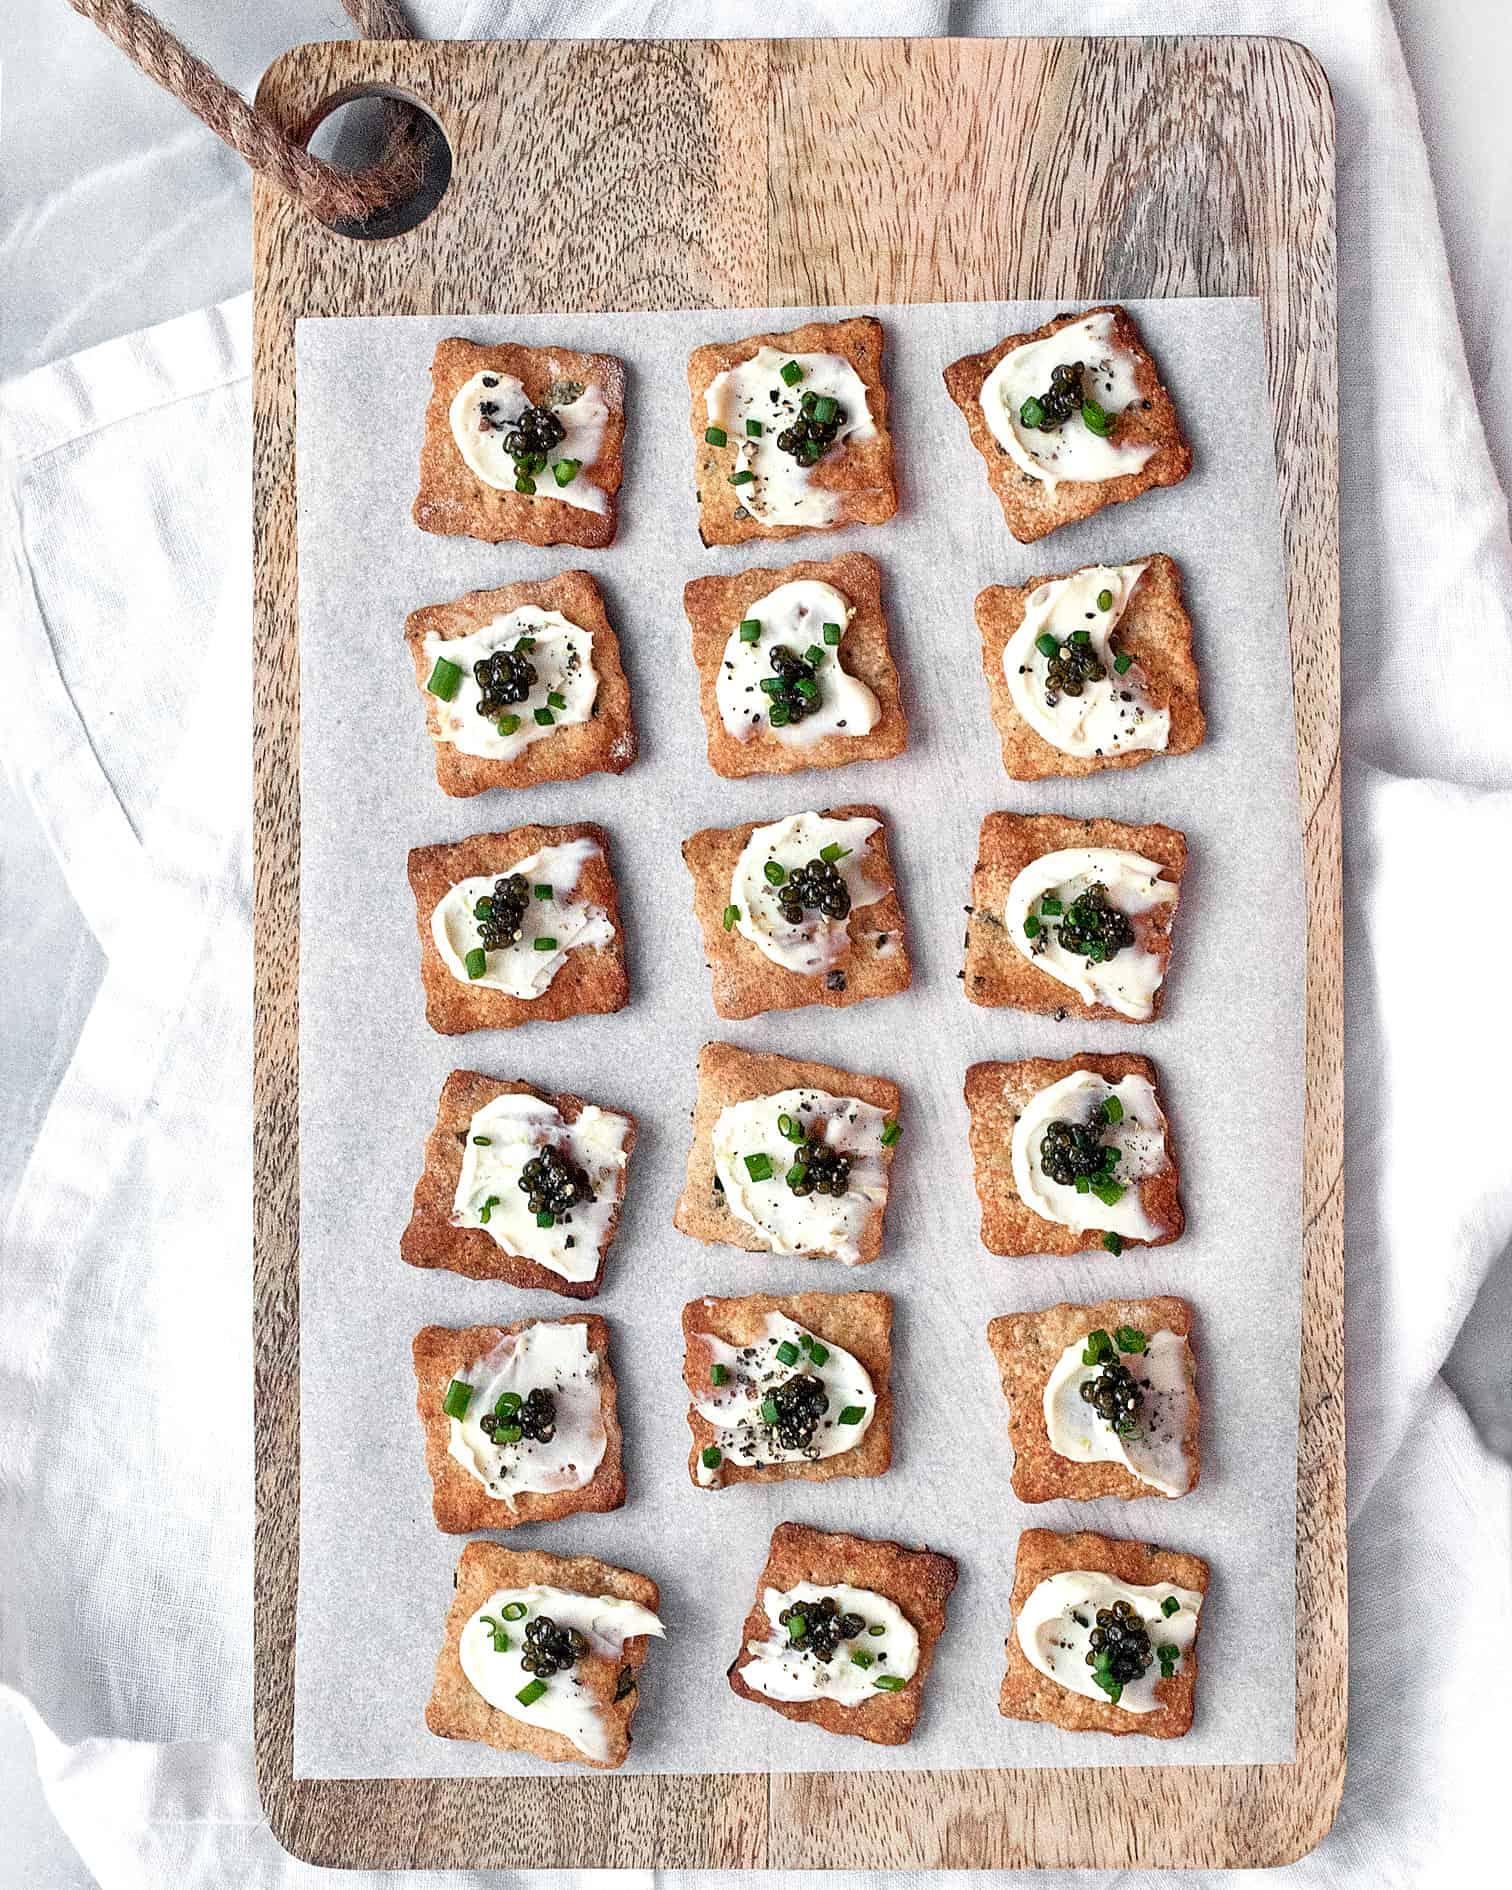 Homemade Herb Crackers with Caviar and Mascarpone